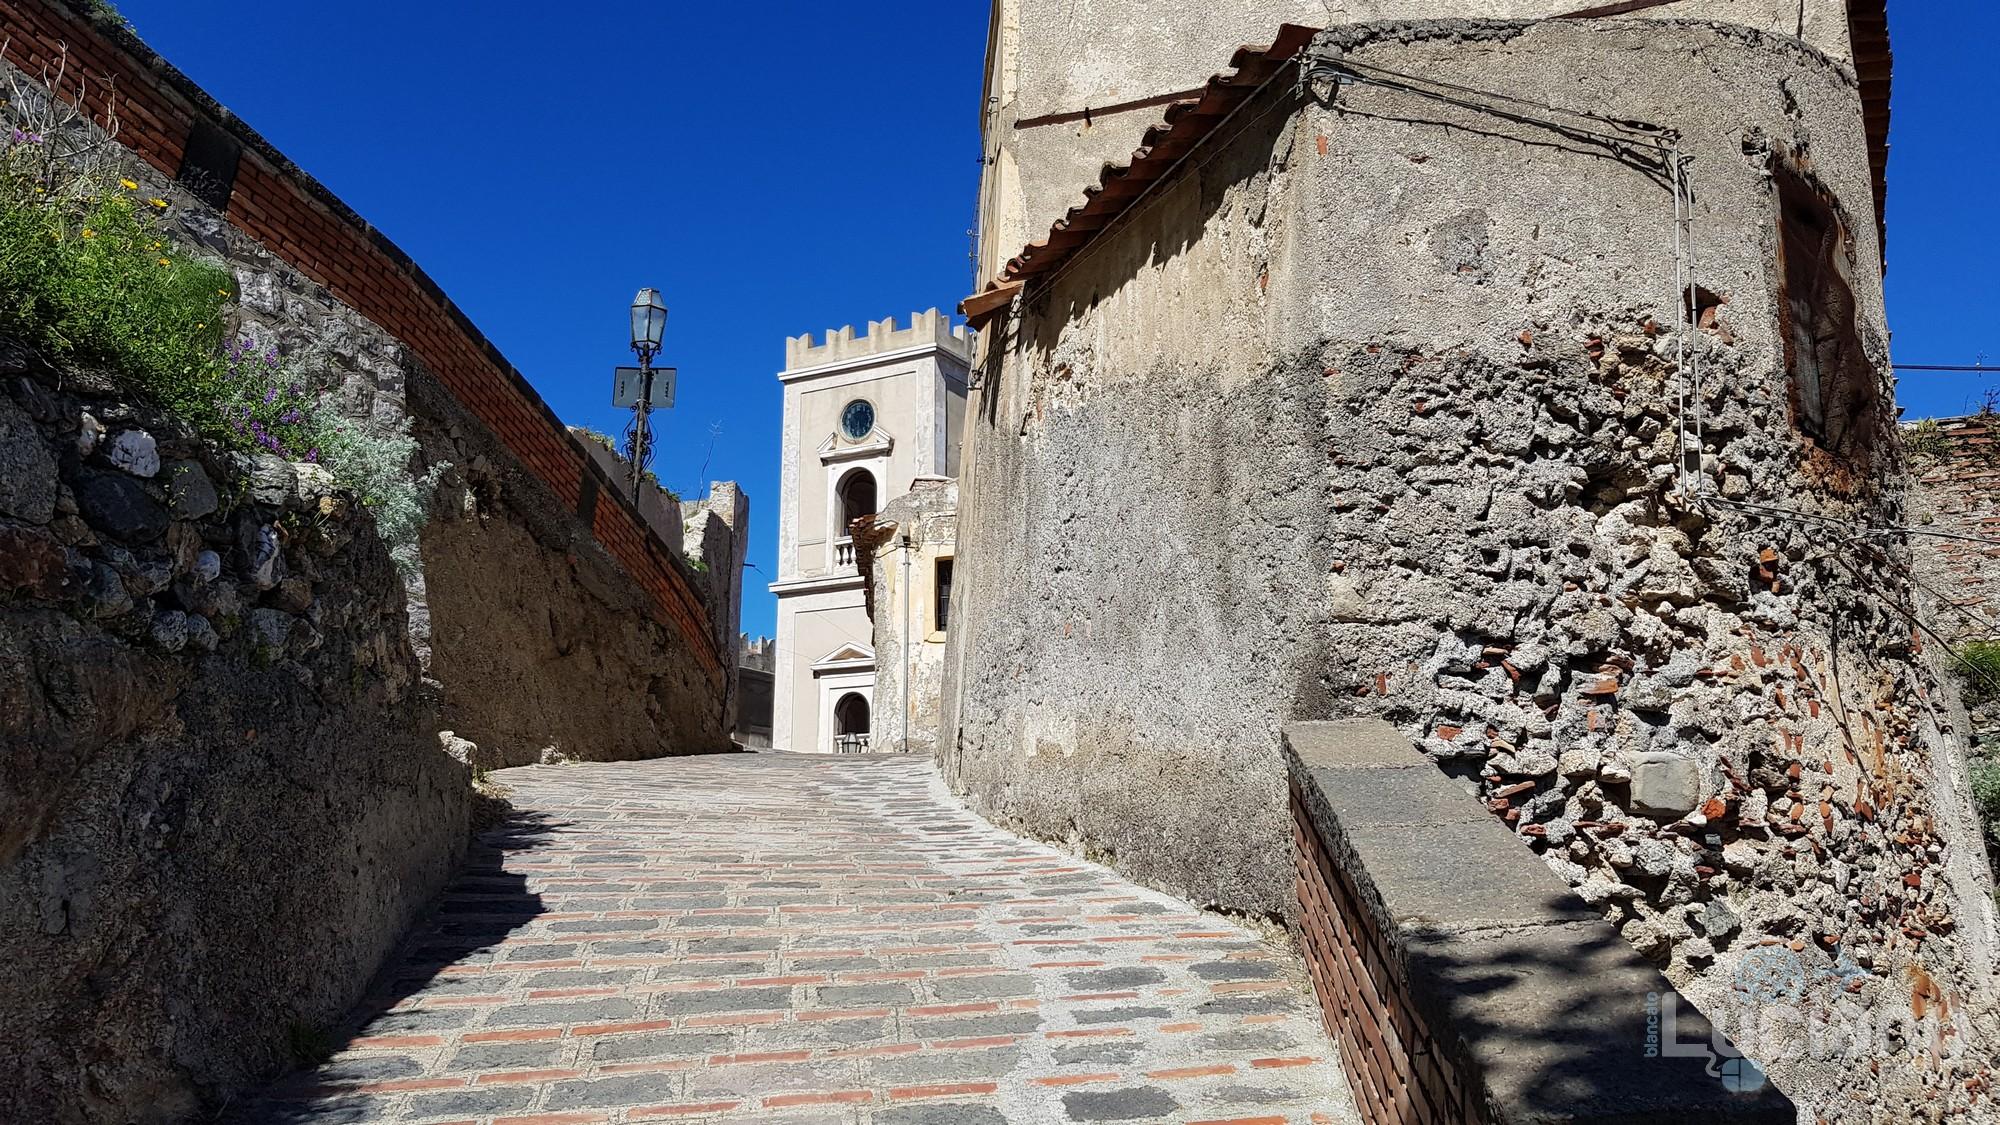 Chiesa di San Nicolò a Savoca (ME)